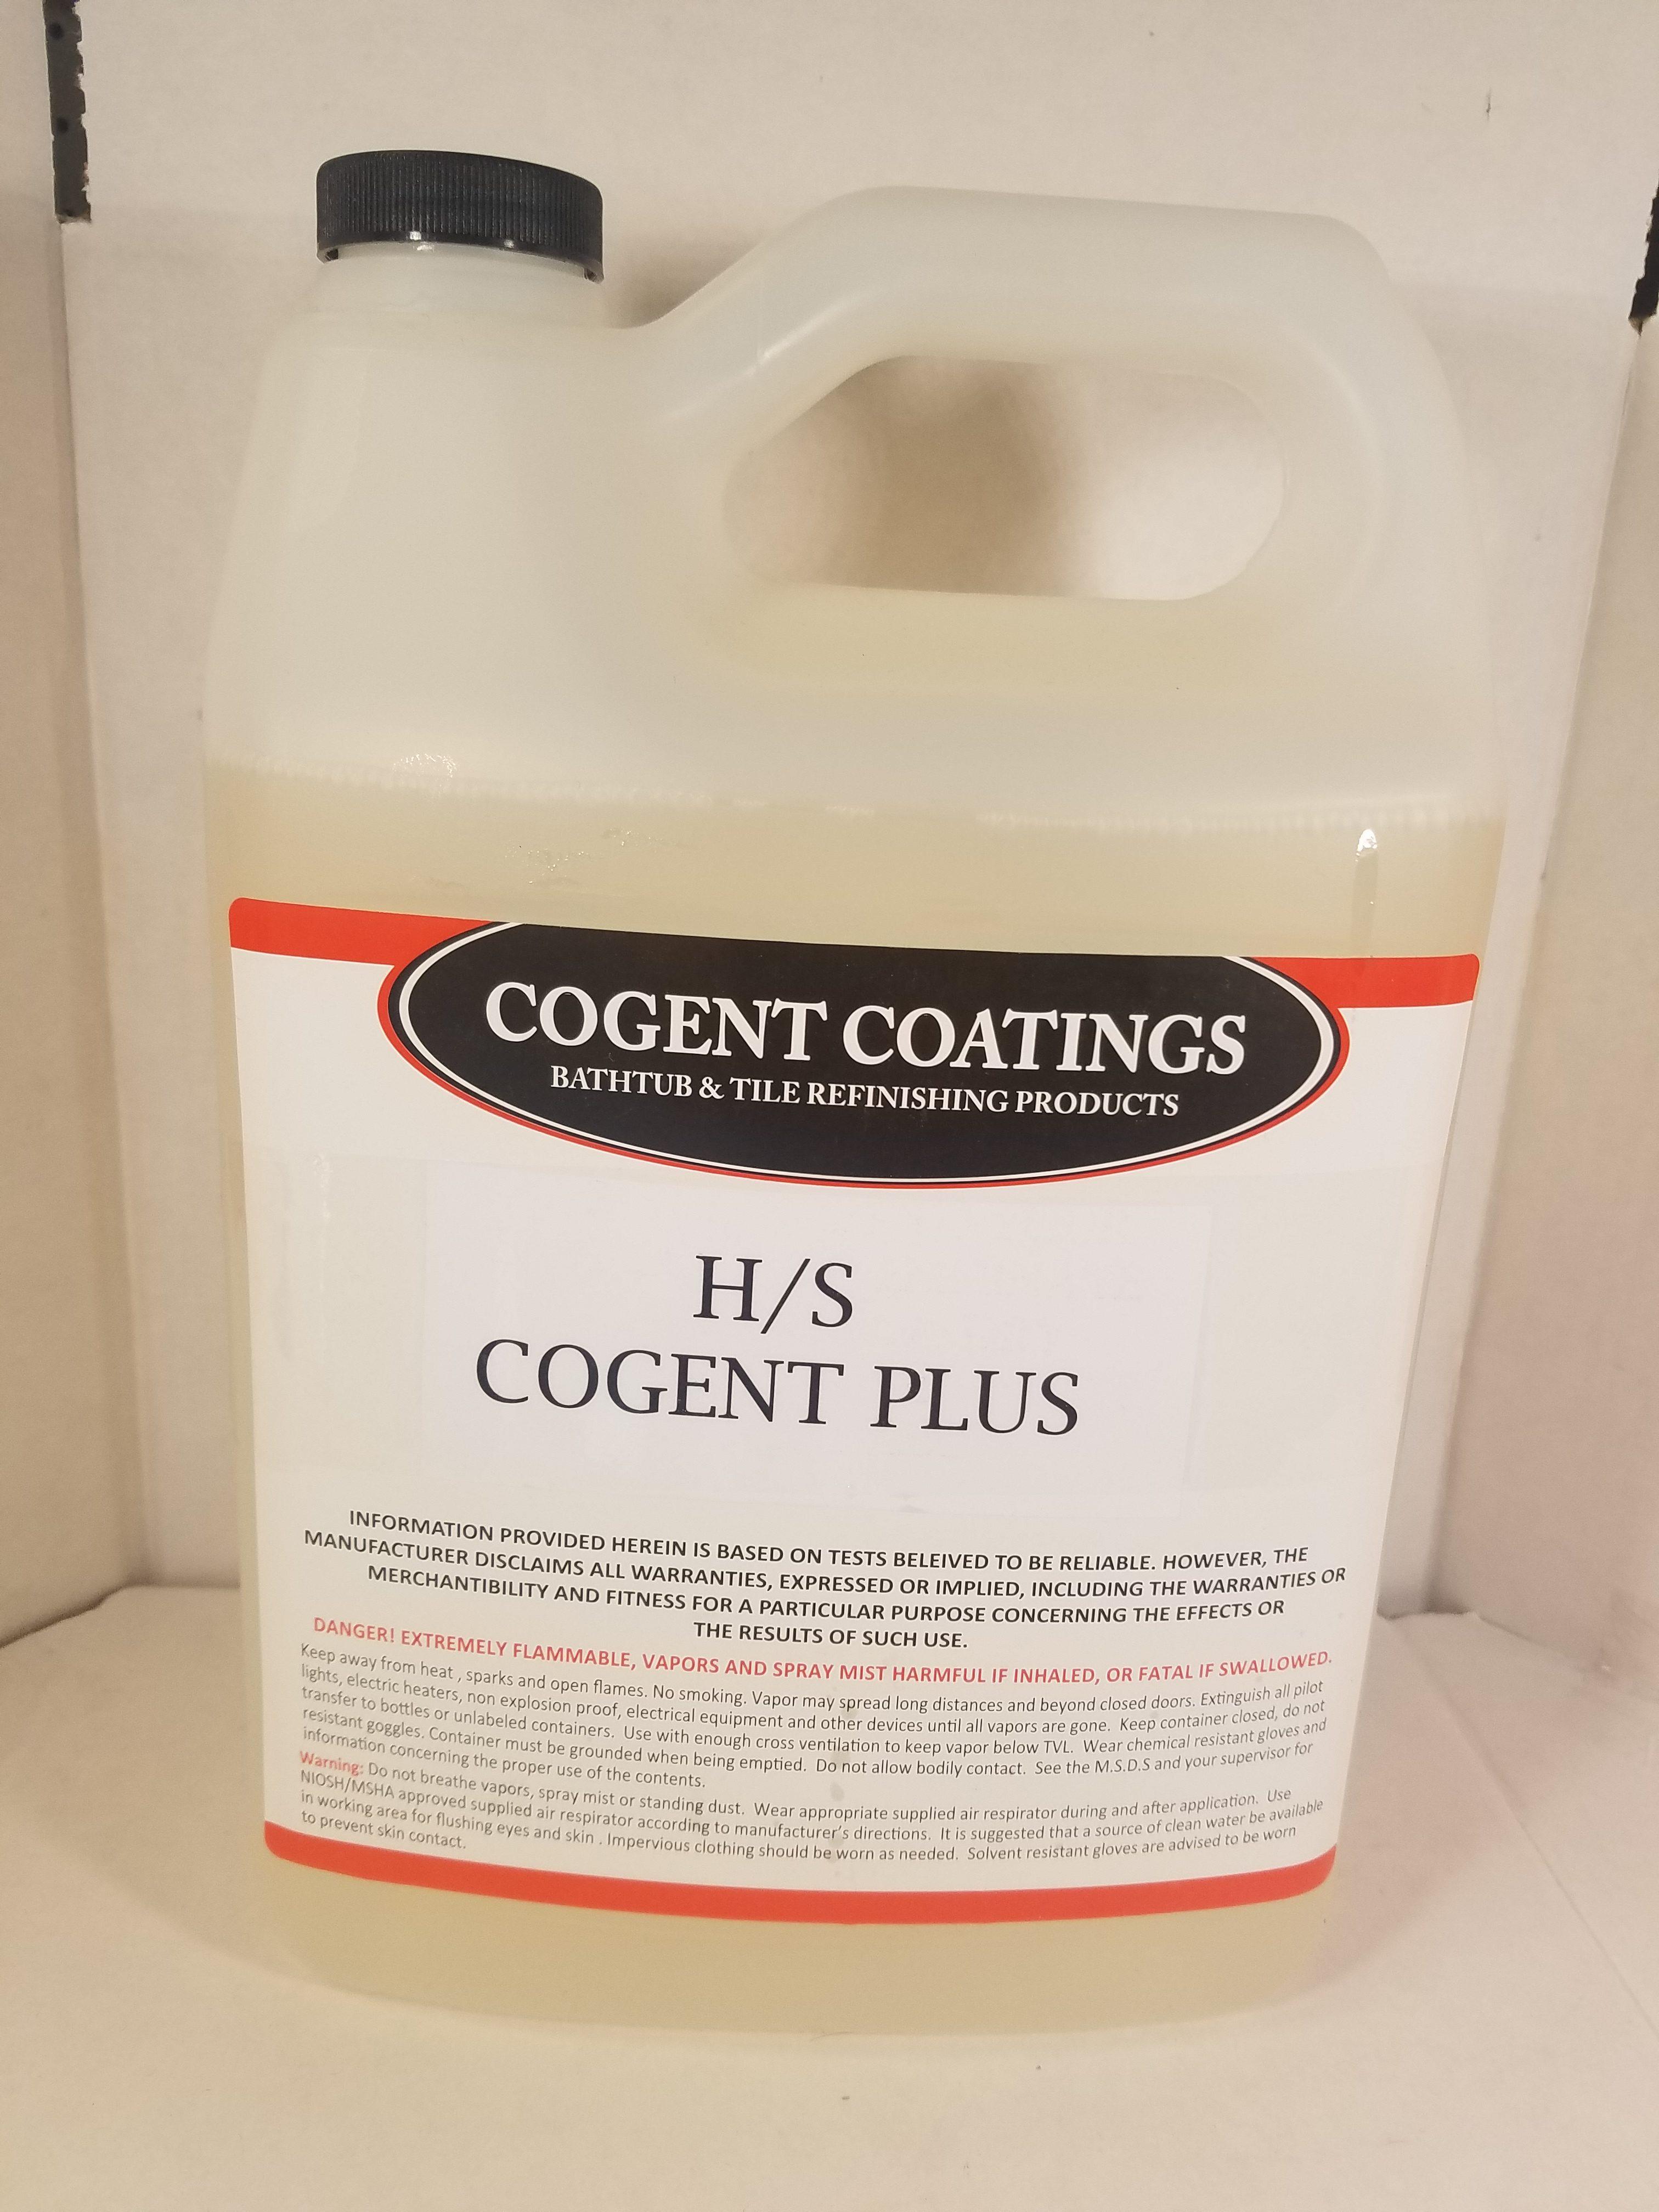 1502399687323125837221   COGENT COATINGS Bathtub Refinishing Products